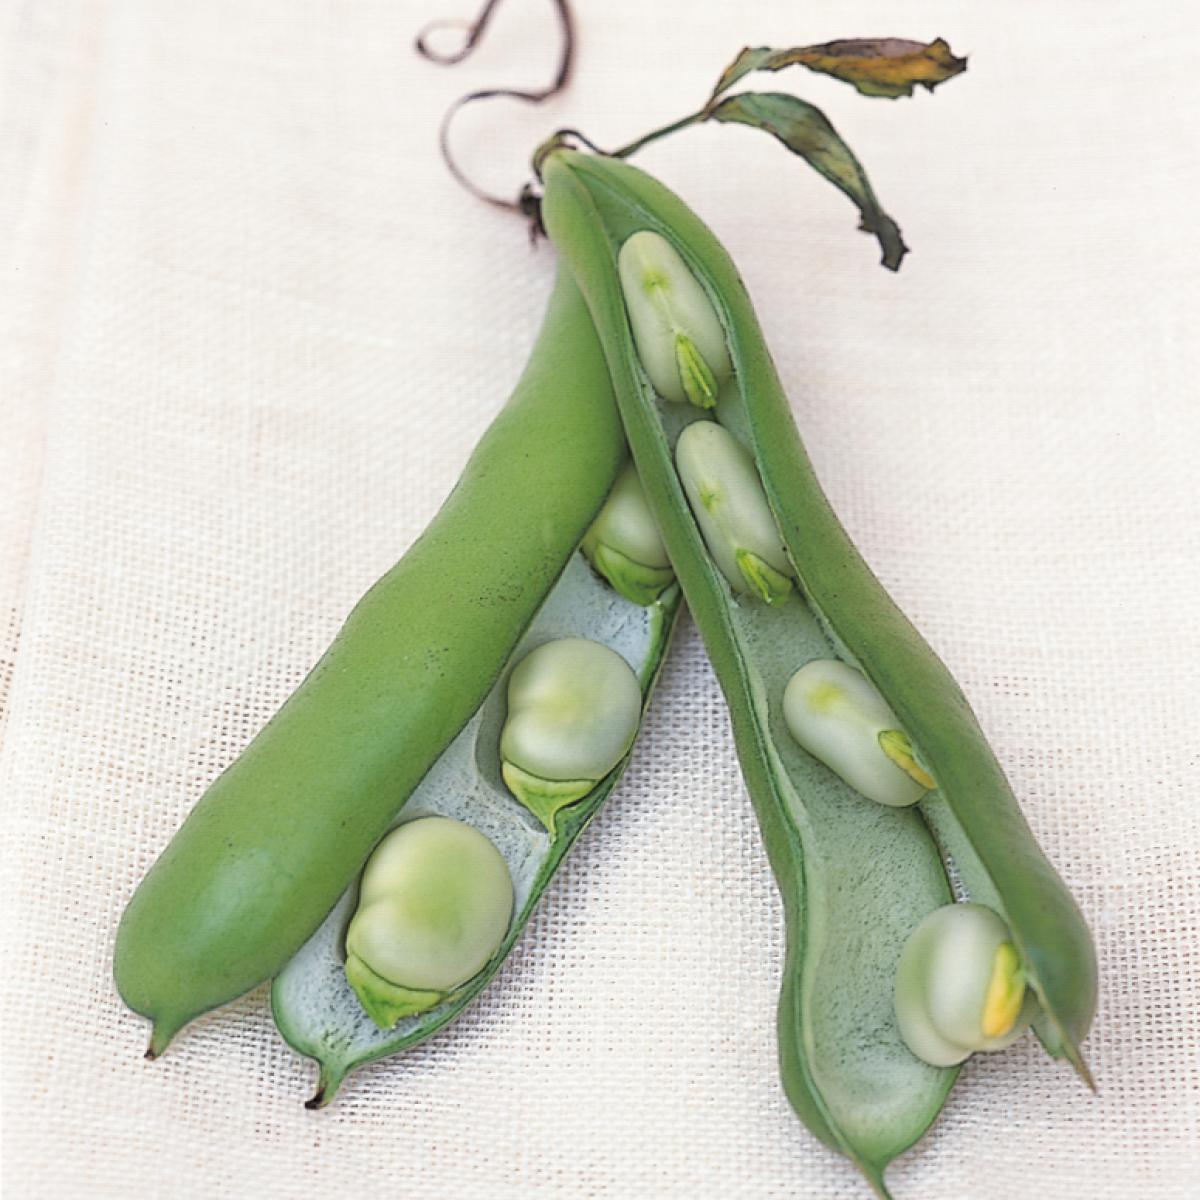 Ingredient htc broad beans